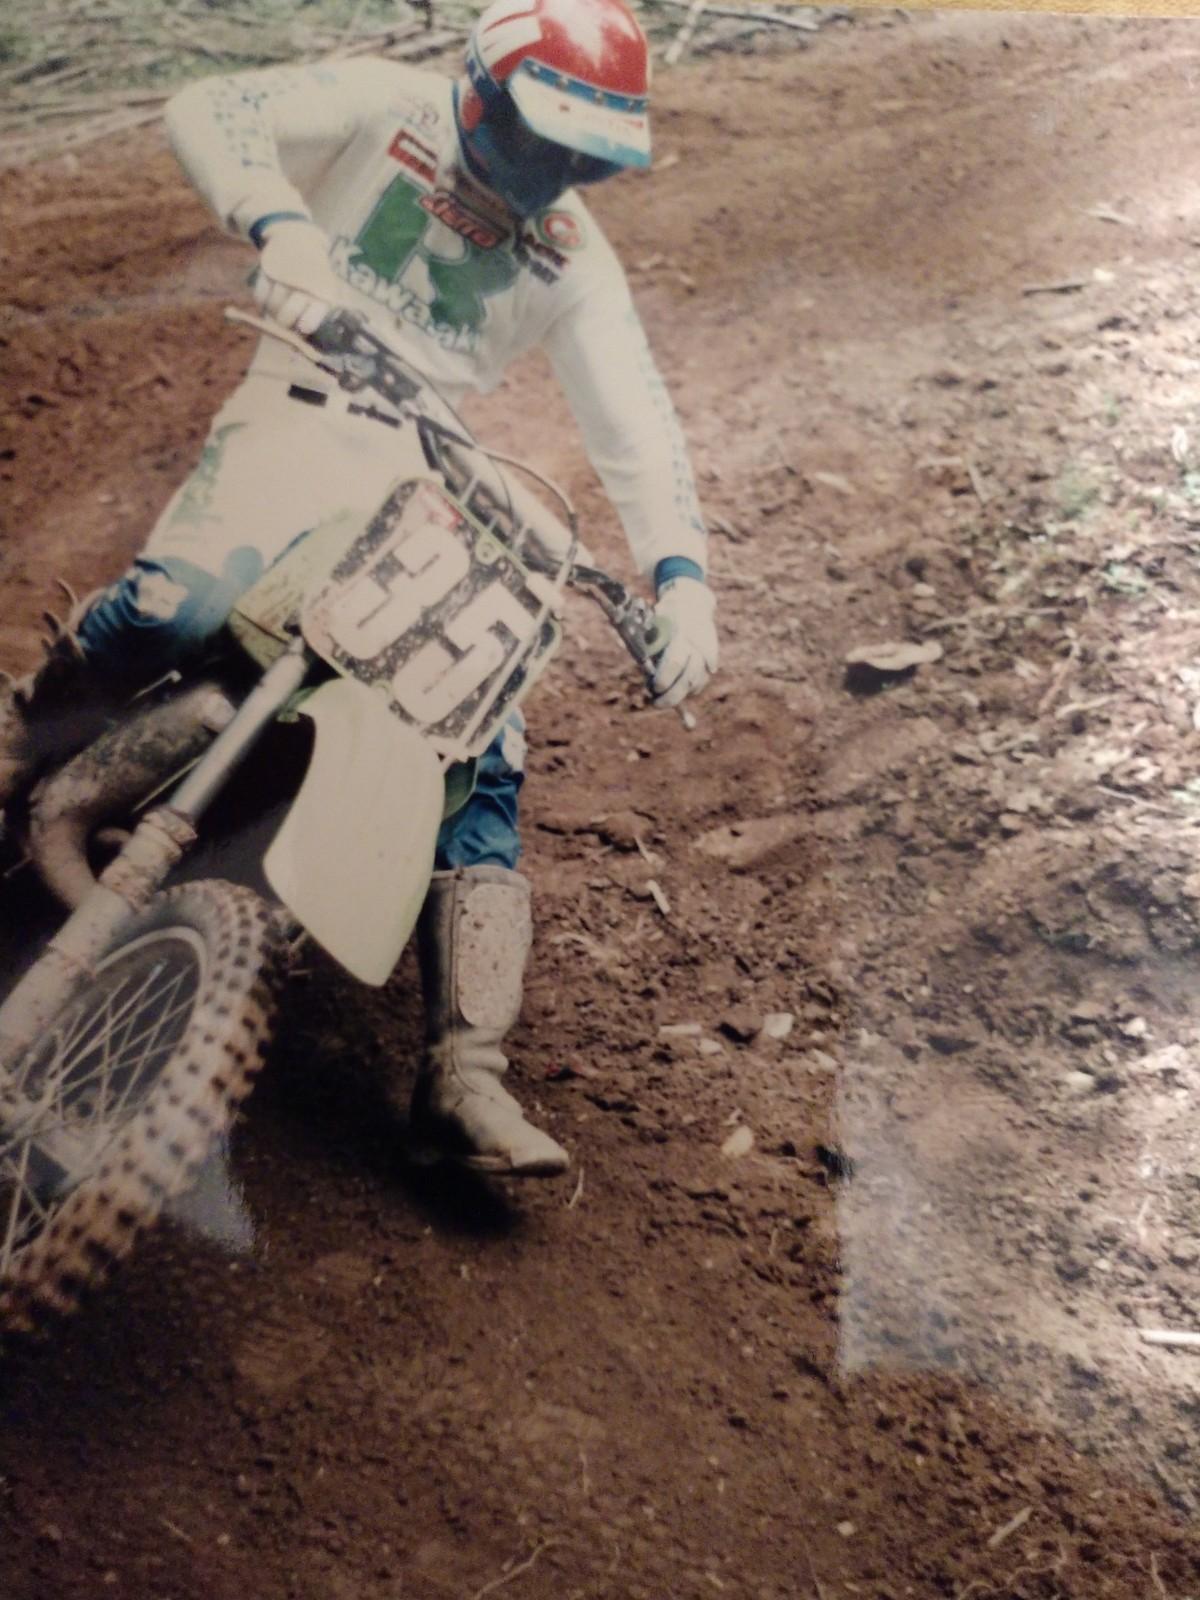 Jeffro 1985 KX 125 - jeffro503 - Motocross Pictures - Vital MX